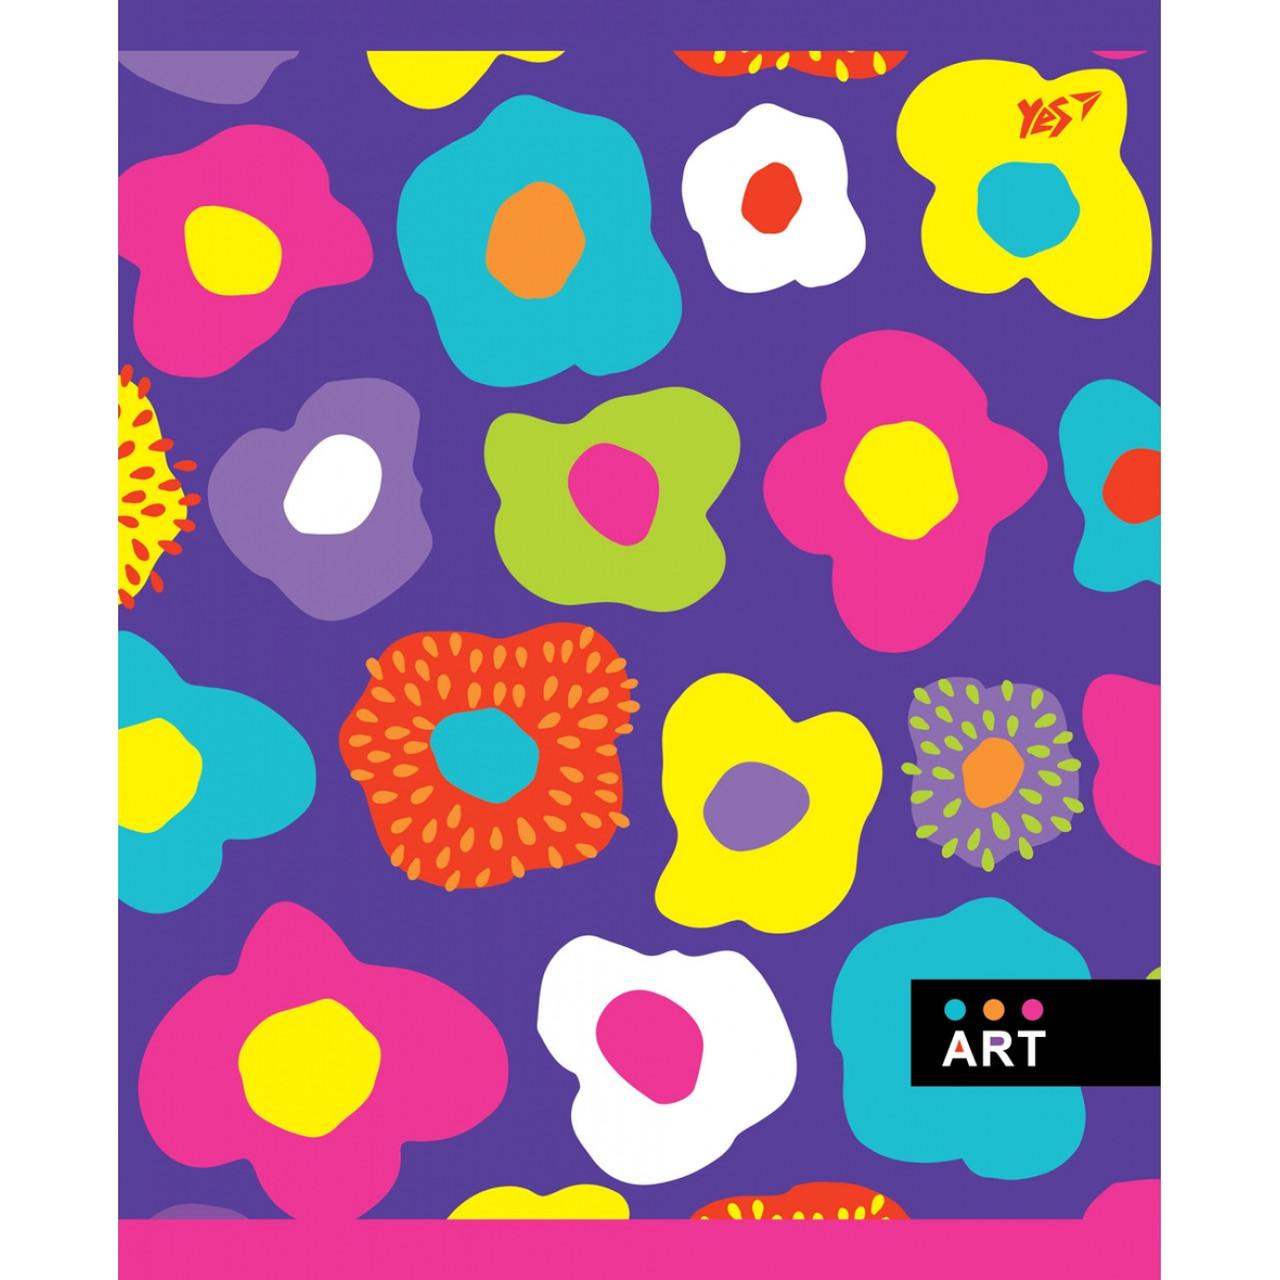 А5/12 линия YES неон+мат.ламинация+софт-тач Abstract neon, тетрадь (упаковка 10 штук)